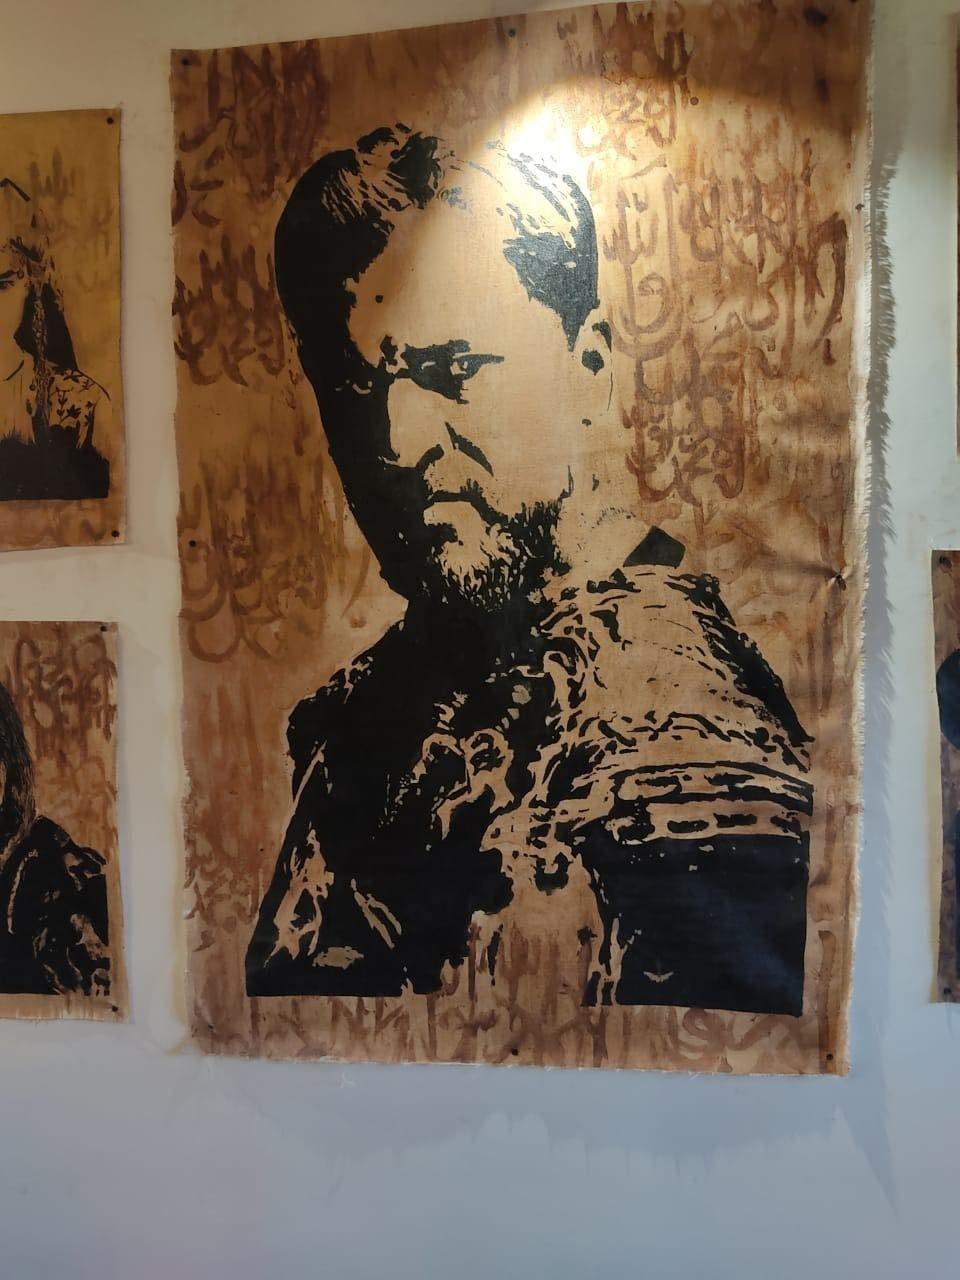 A close up of the portrait of Ertuğrul Ghazi, played by actor Engin Altan Düzyatan, in Kardeşler - The Kashmir Café. (Photo Courtesy of Shadab Chashoo)